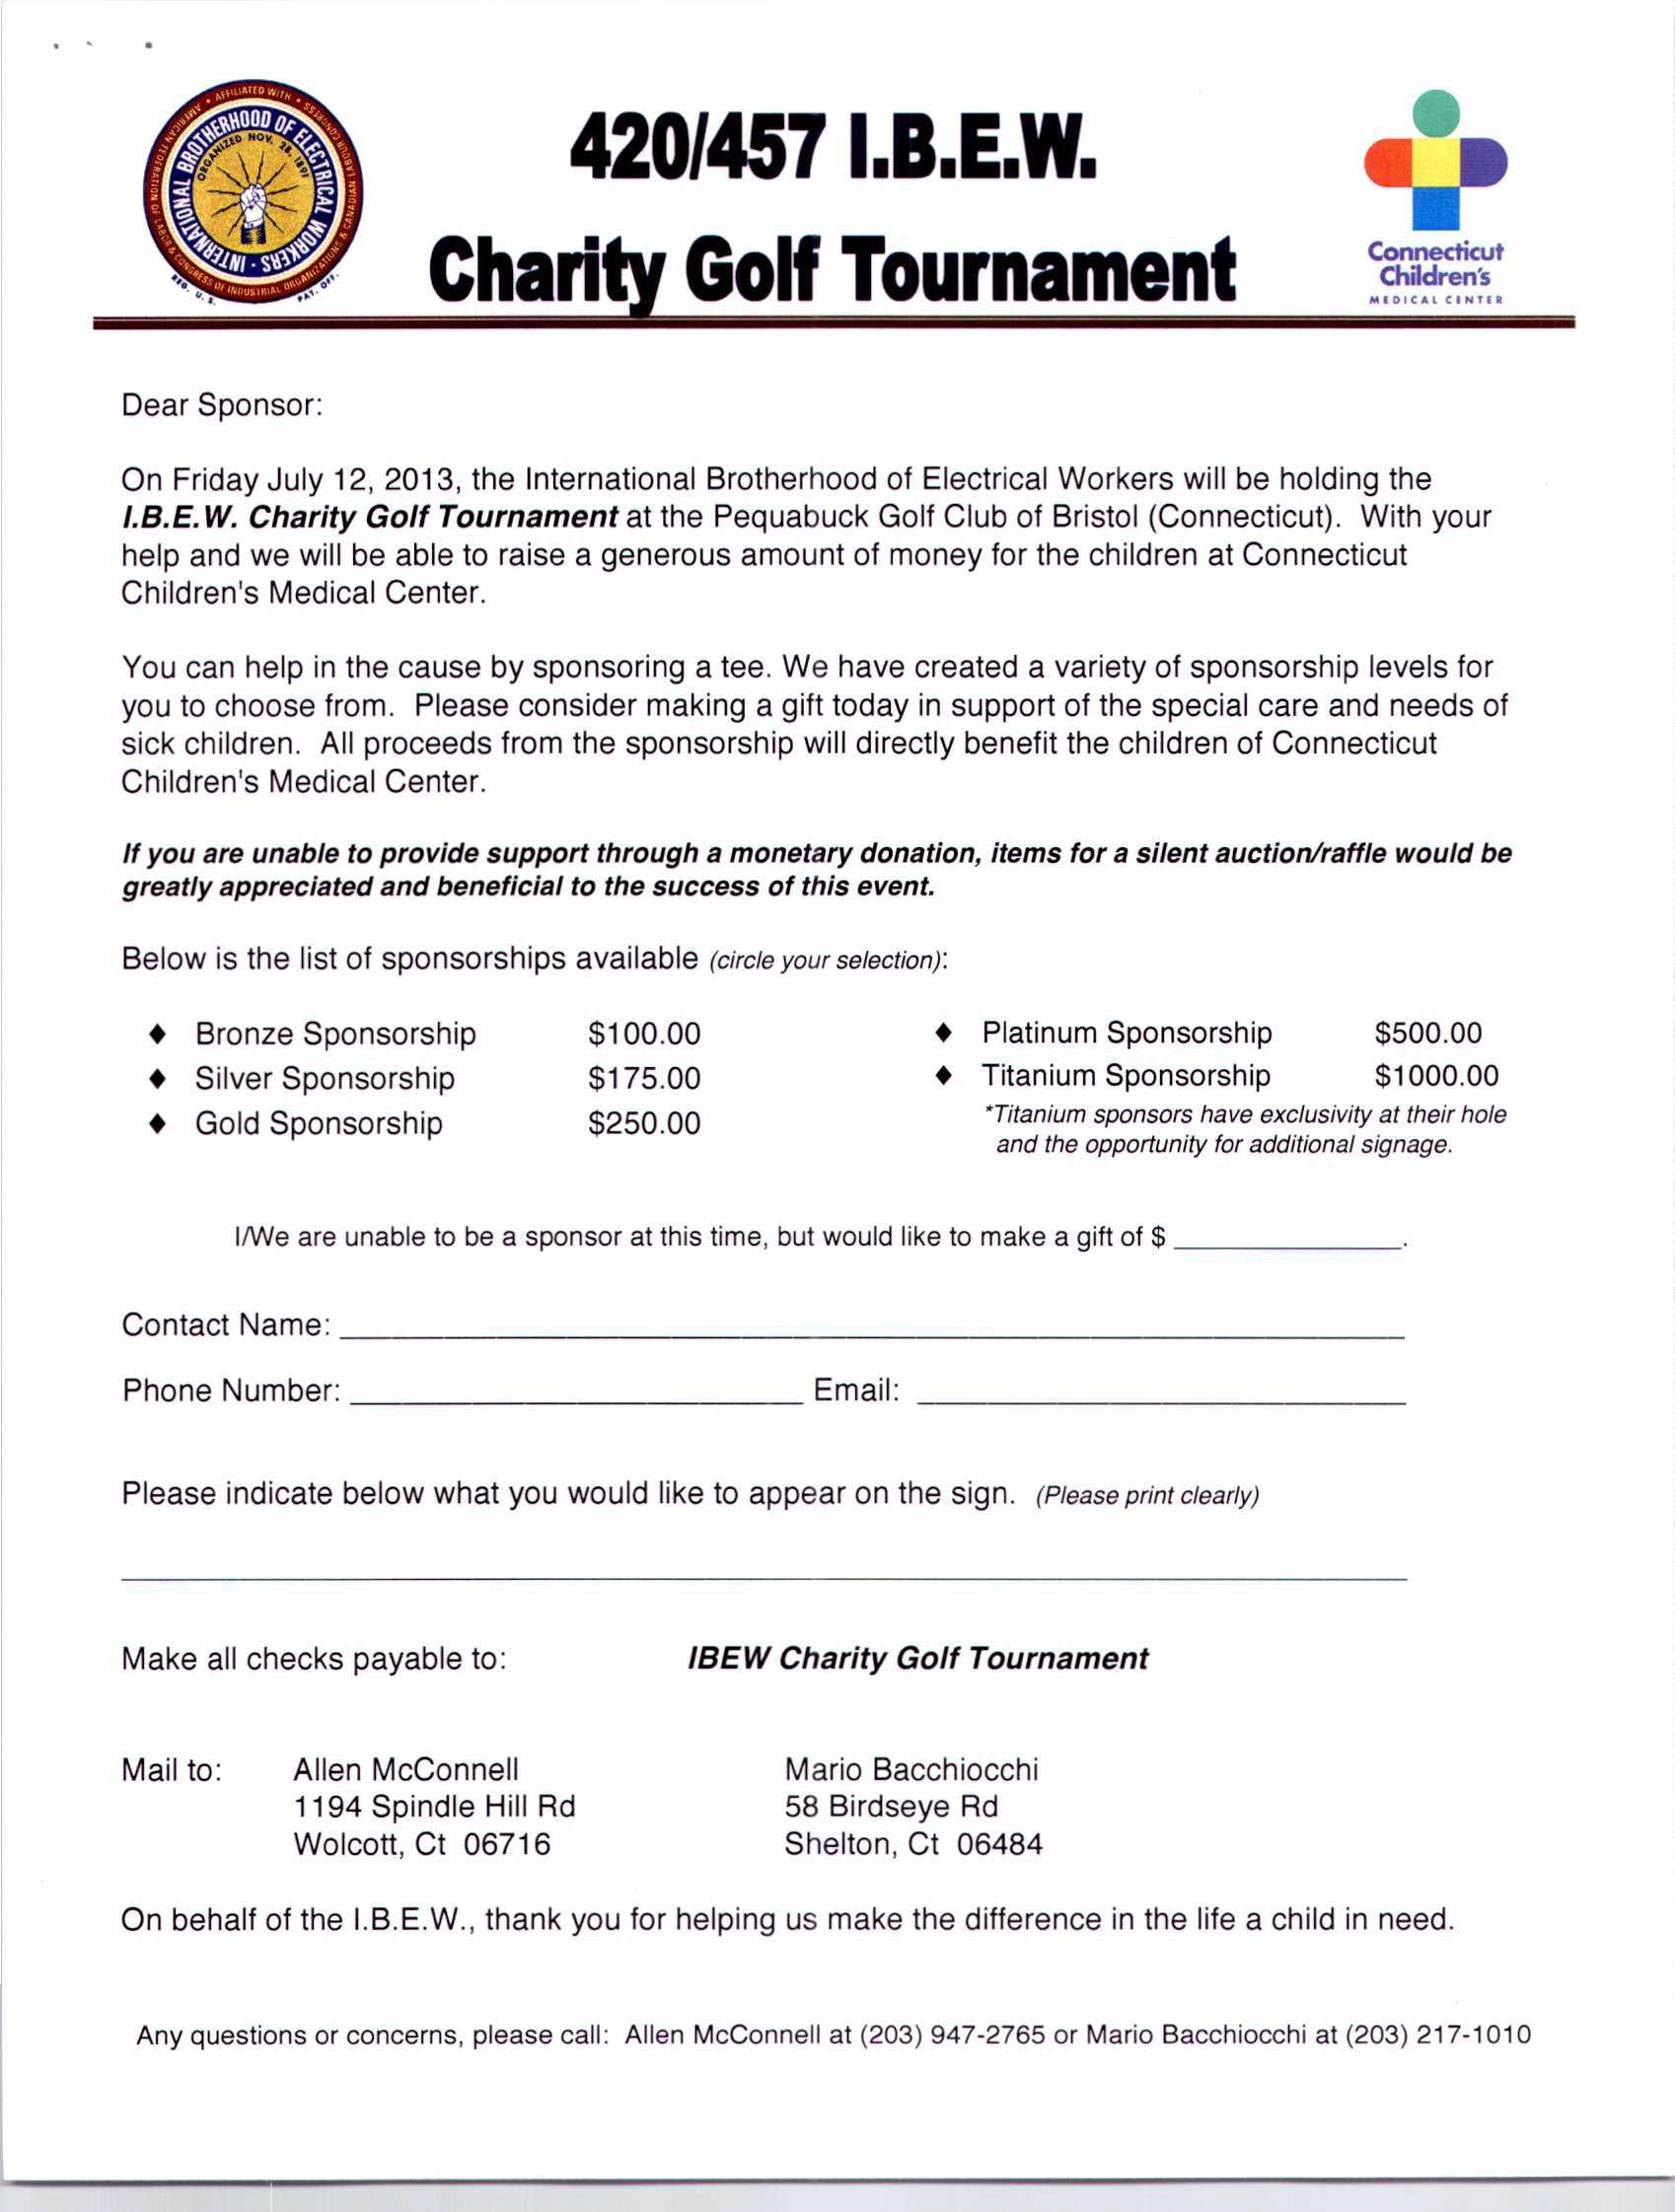 Golf tournament Sponsorship Letter Template - Golf tournament Sponsorship